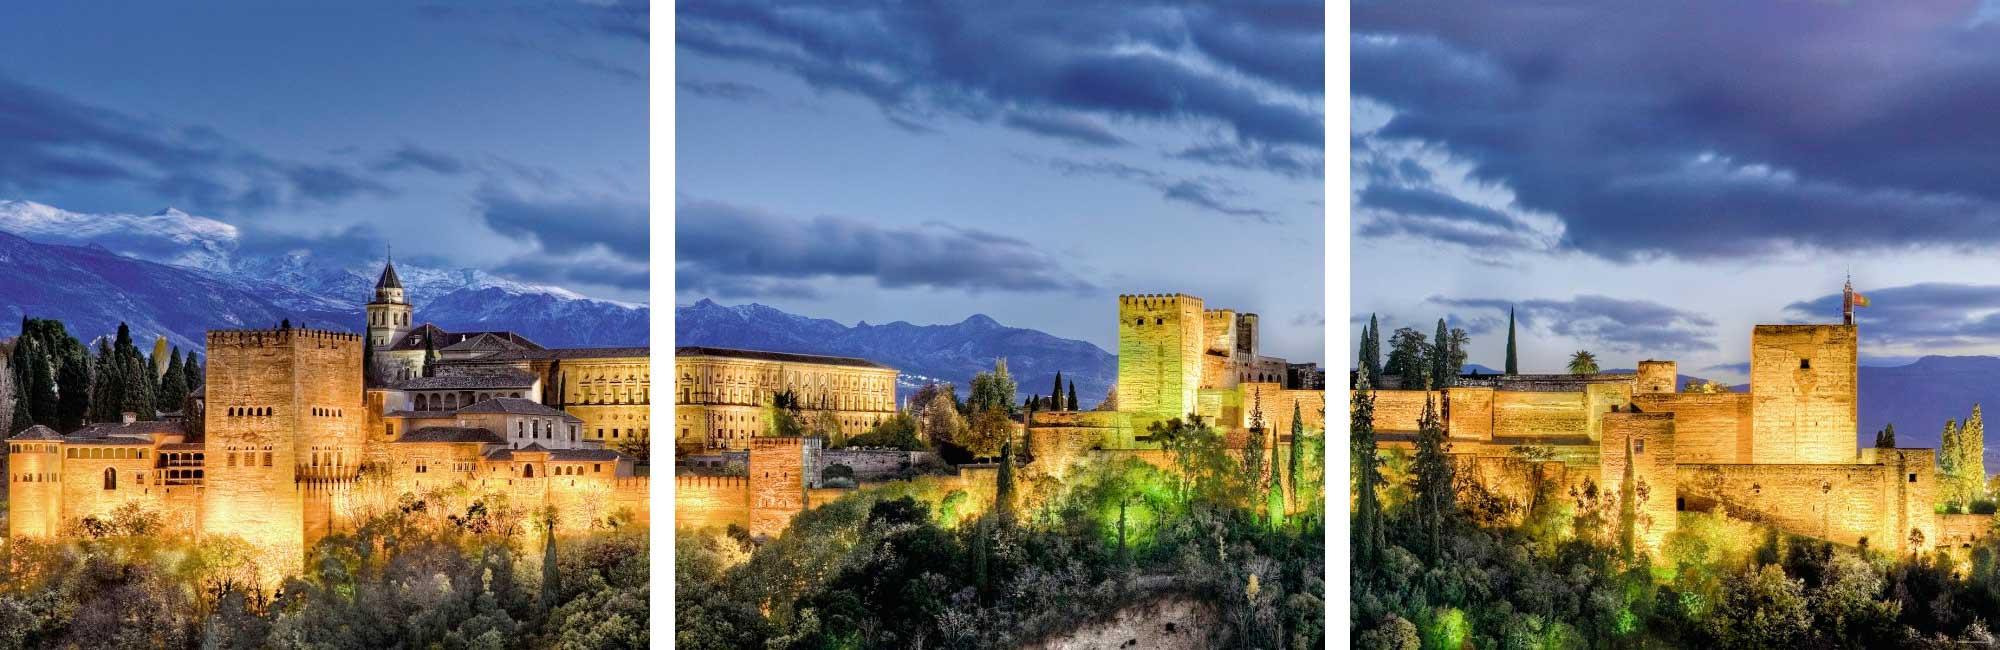 Puzzle Ravensburger La Alhambra al Atardecer 3 x 500 Piezas